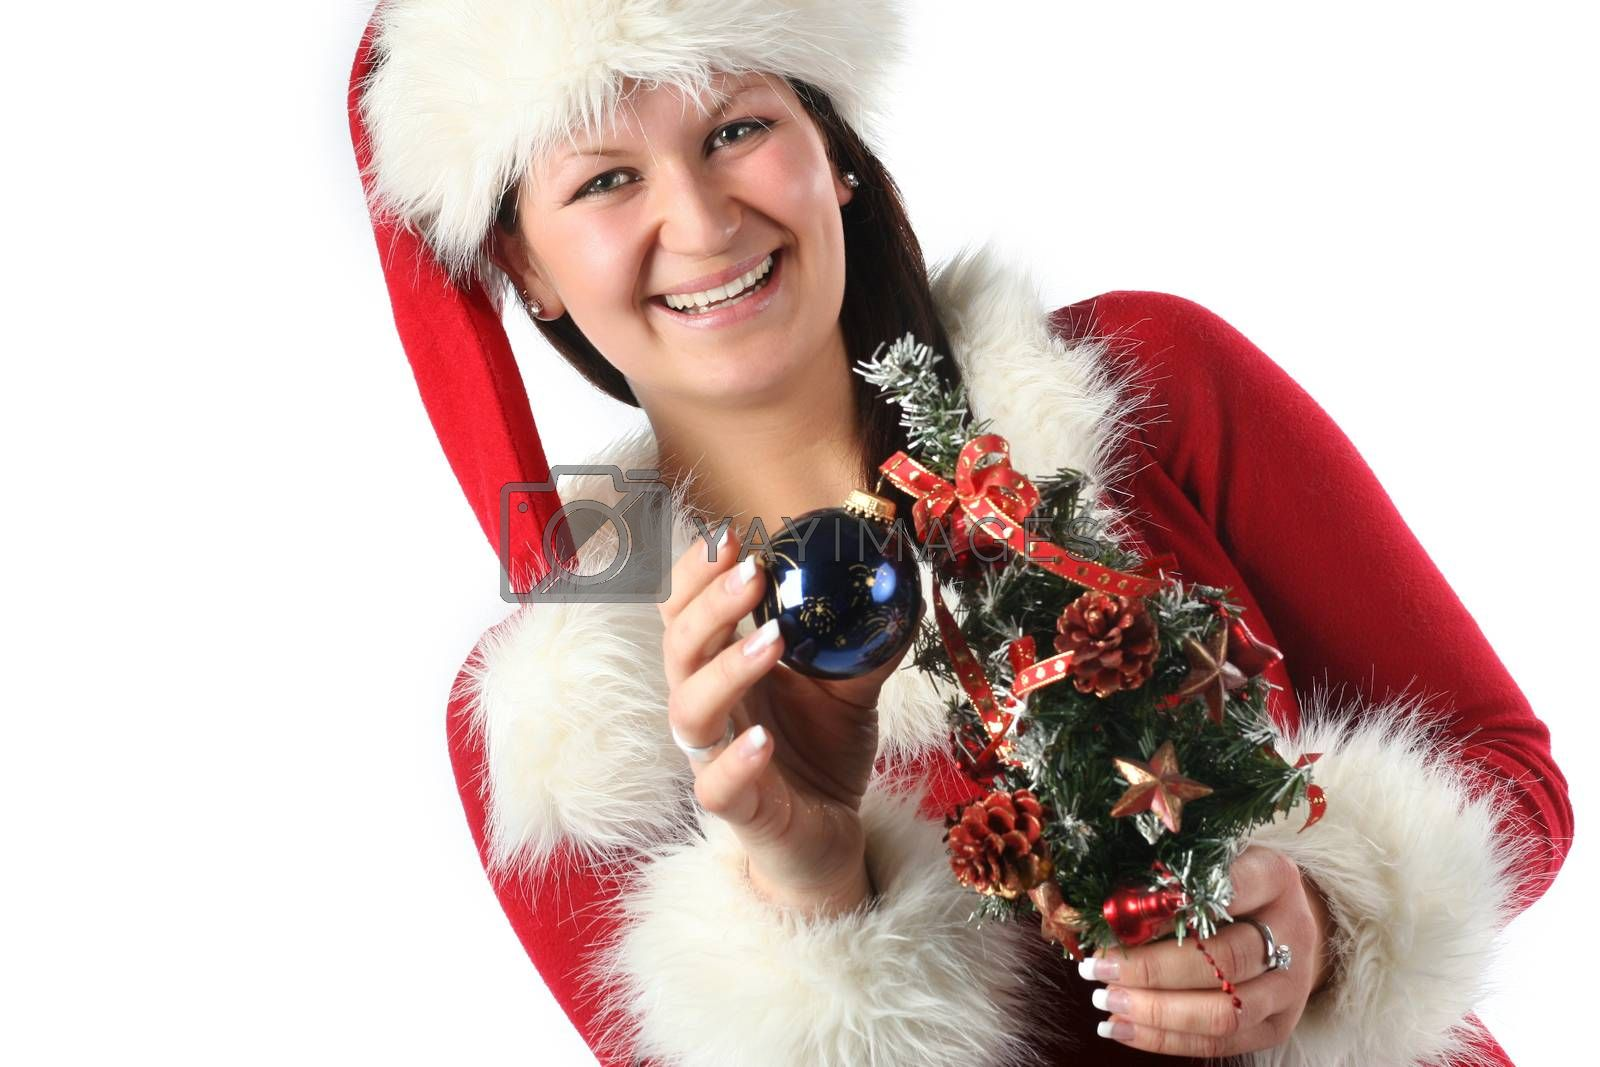 Nice Santa Claus's girl